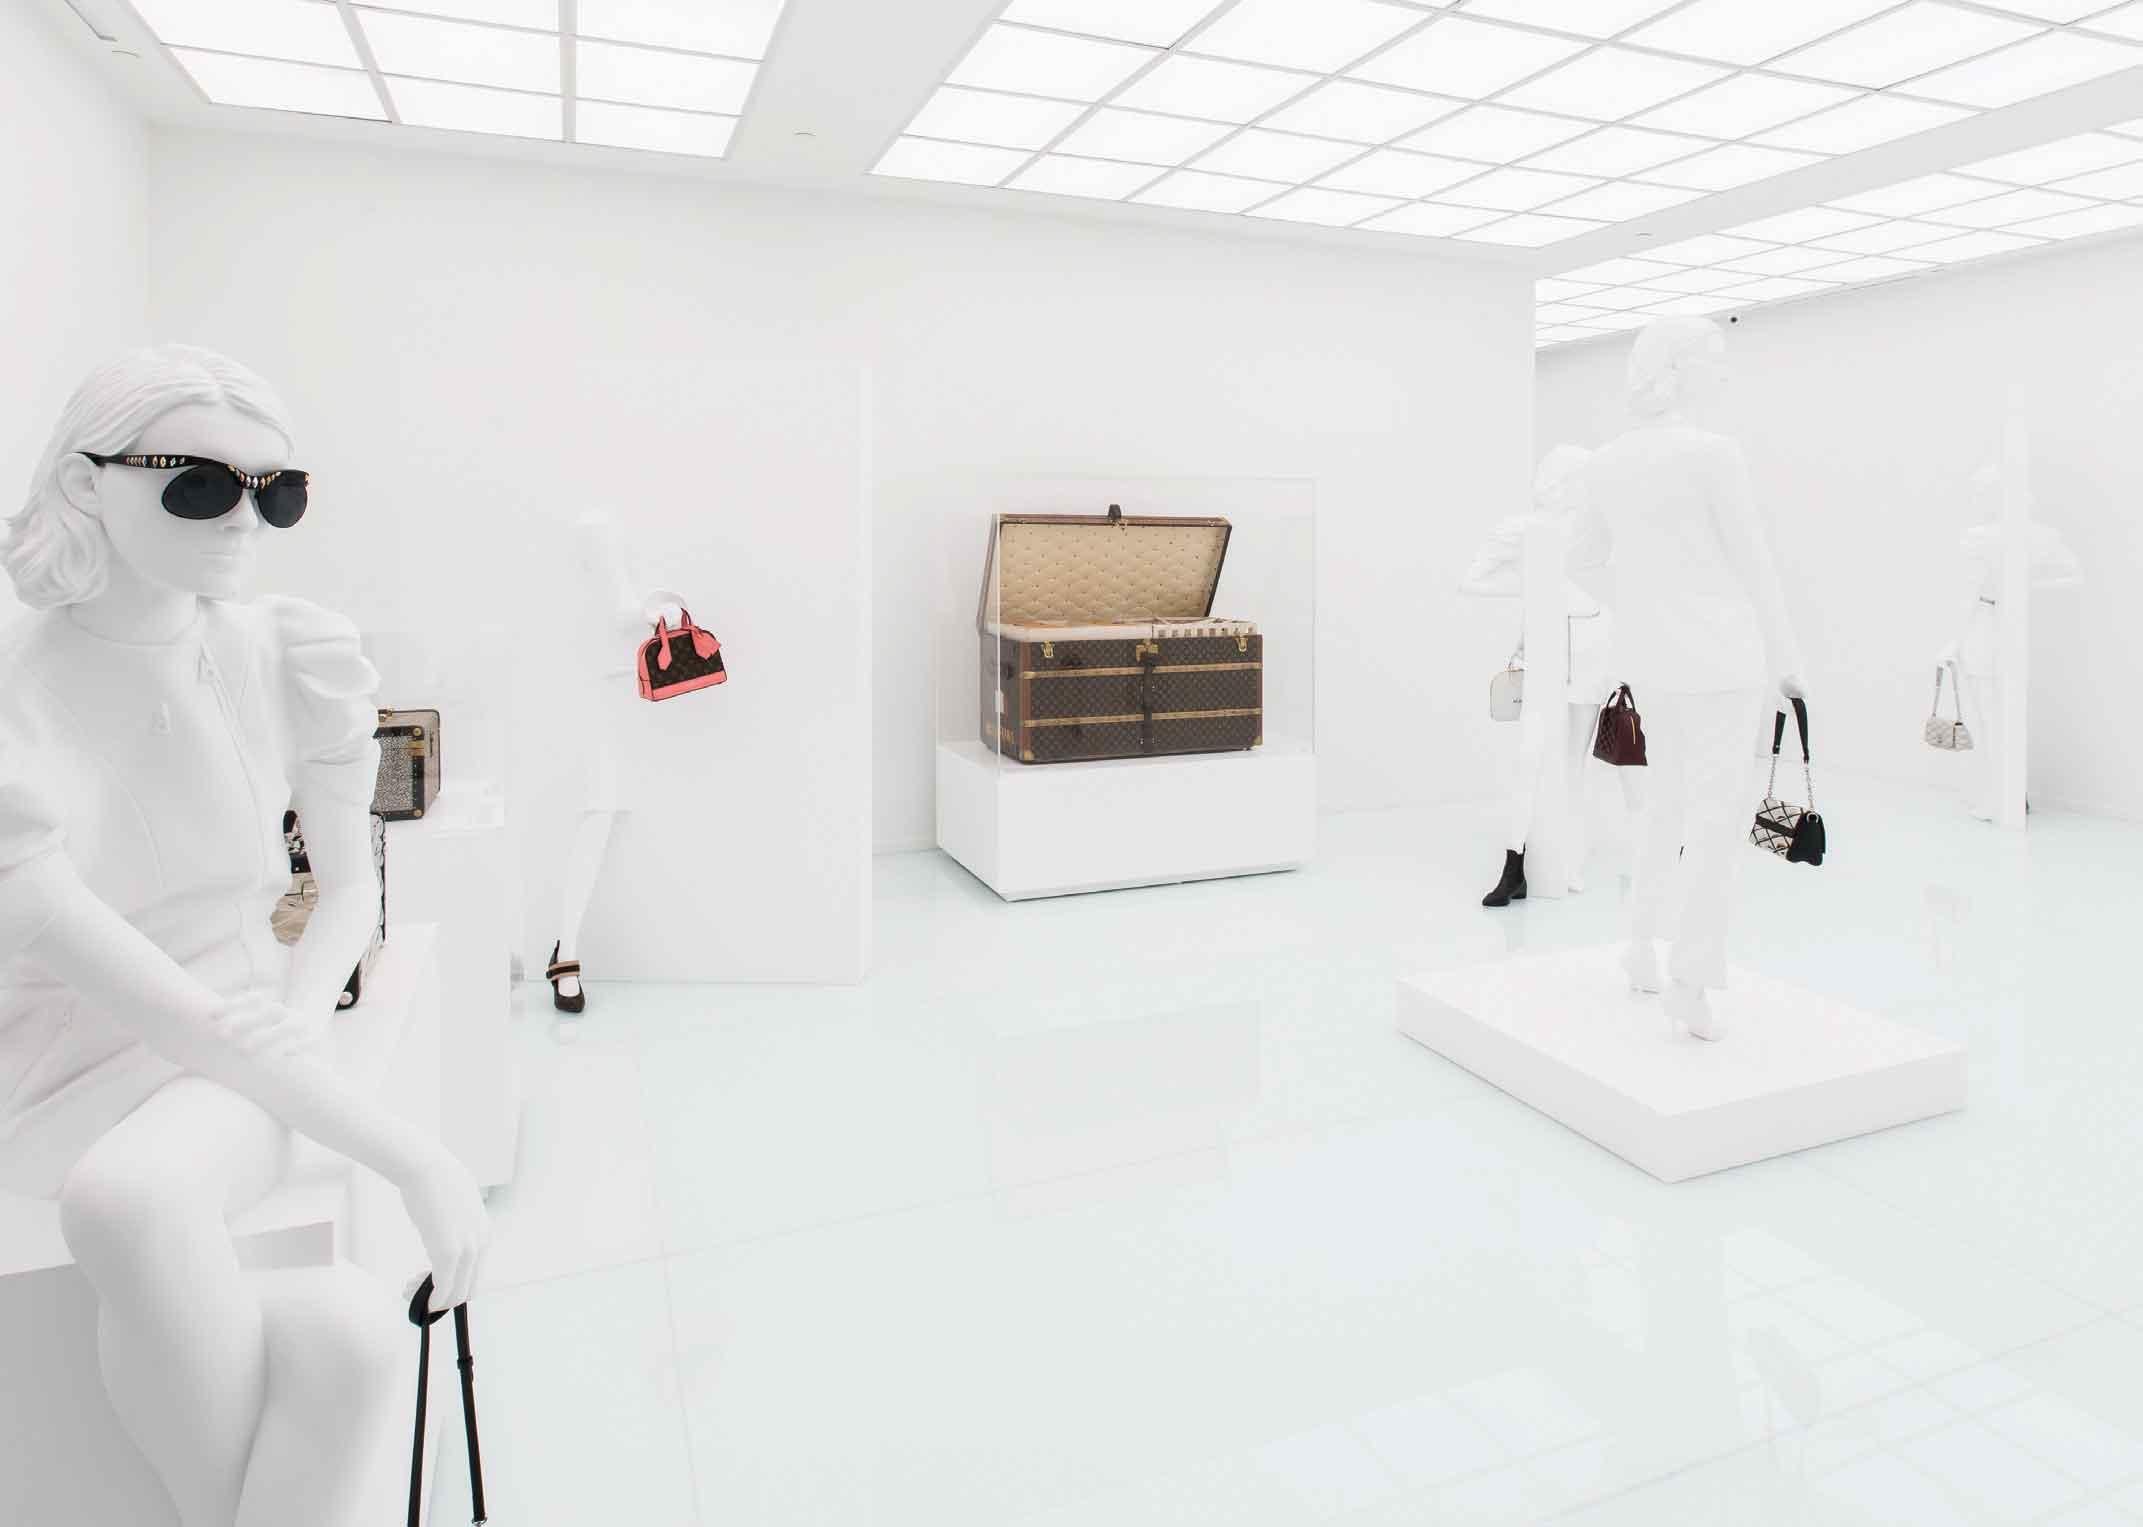 Louis Vuitton Gelar Ekshibisi Atraktif di The Shoppes Marina Bay Sands